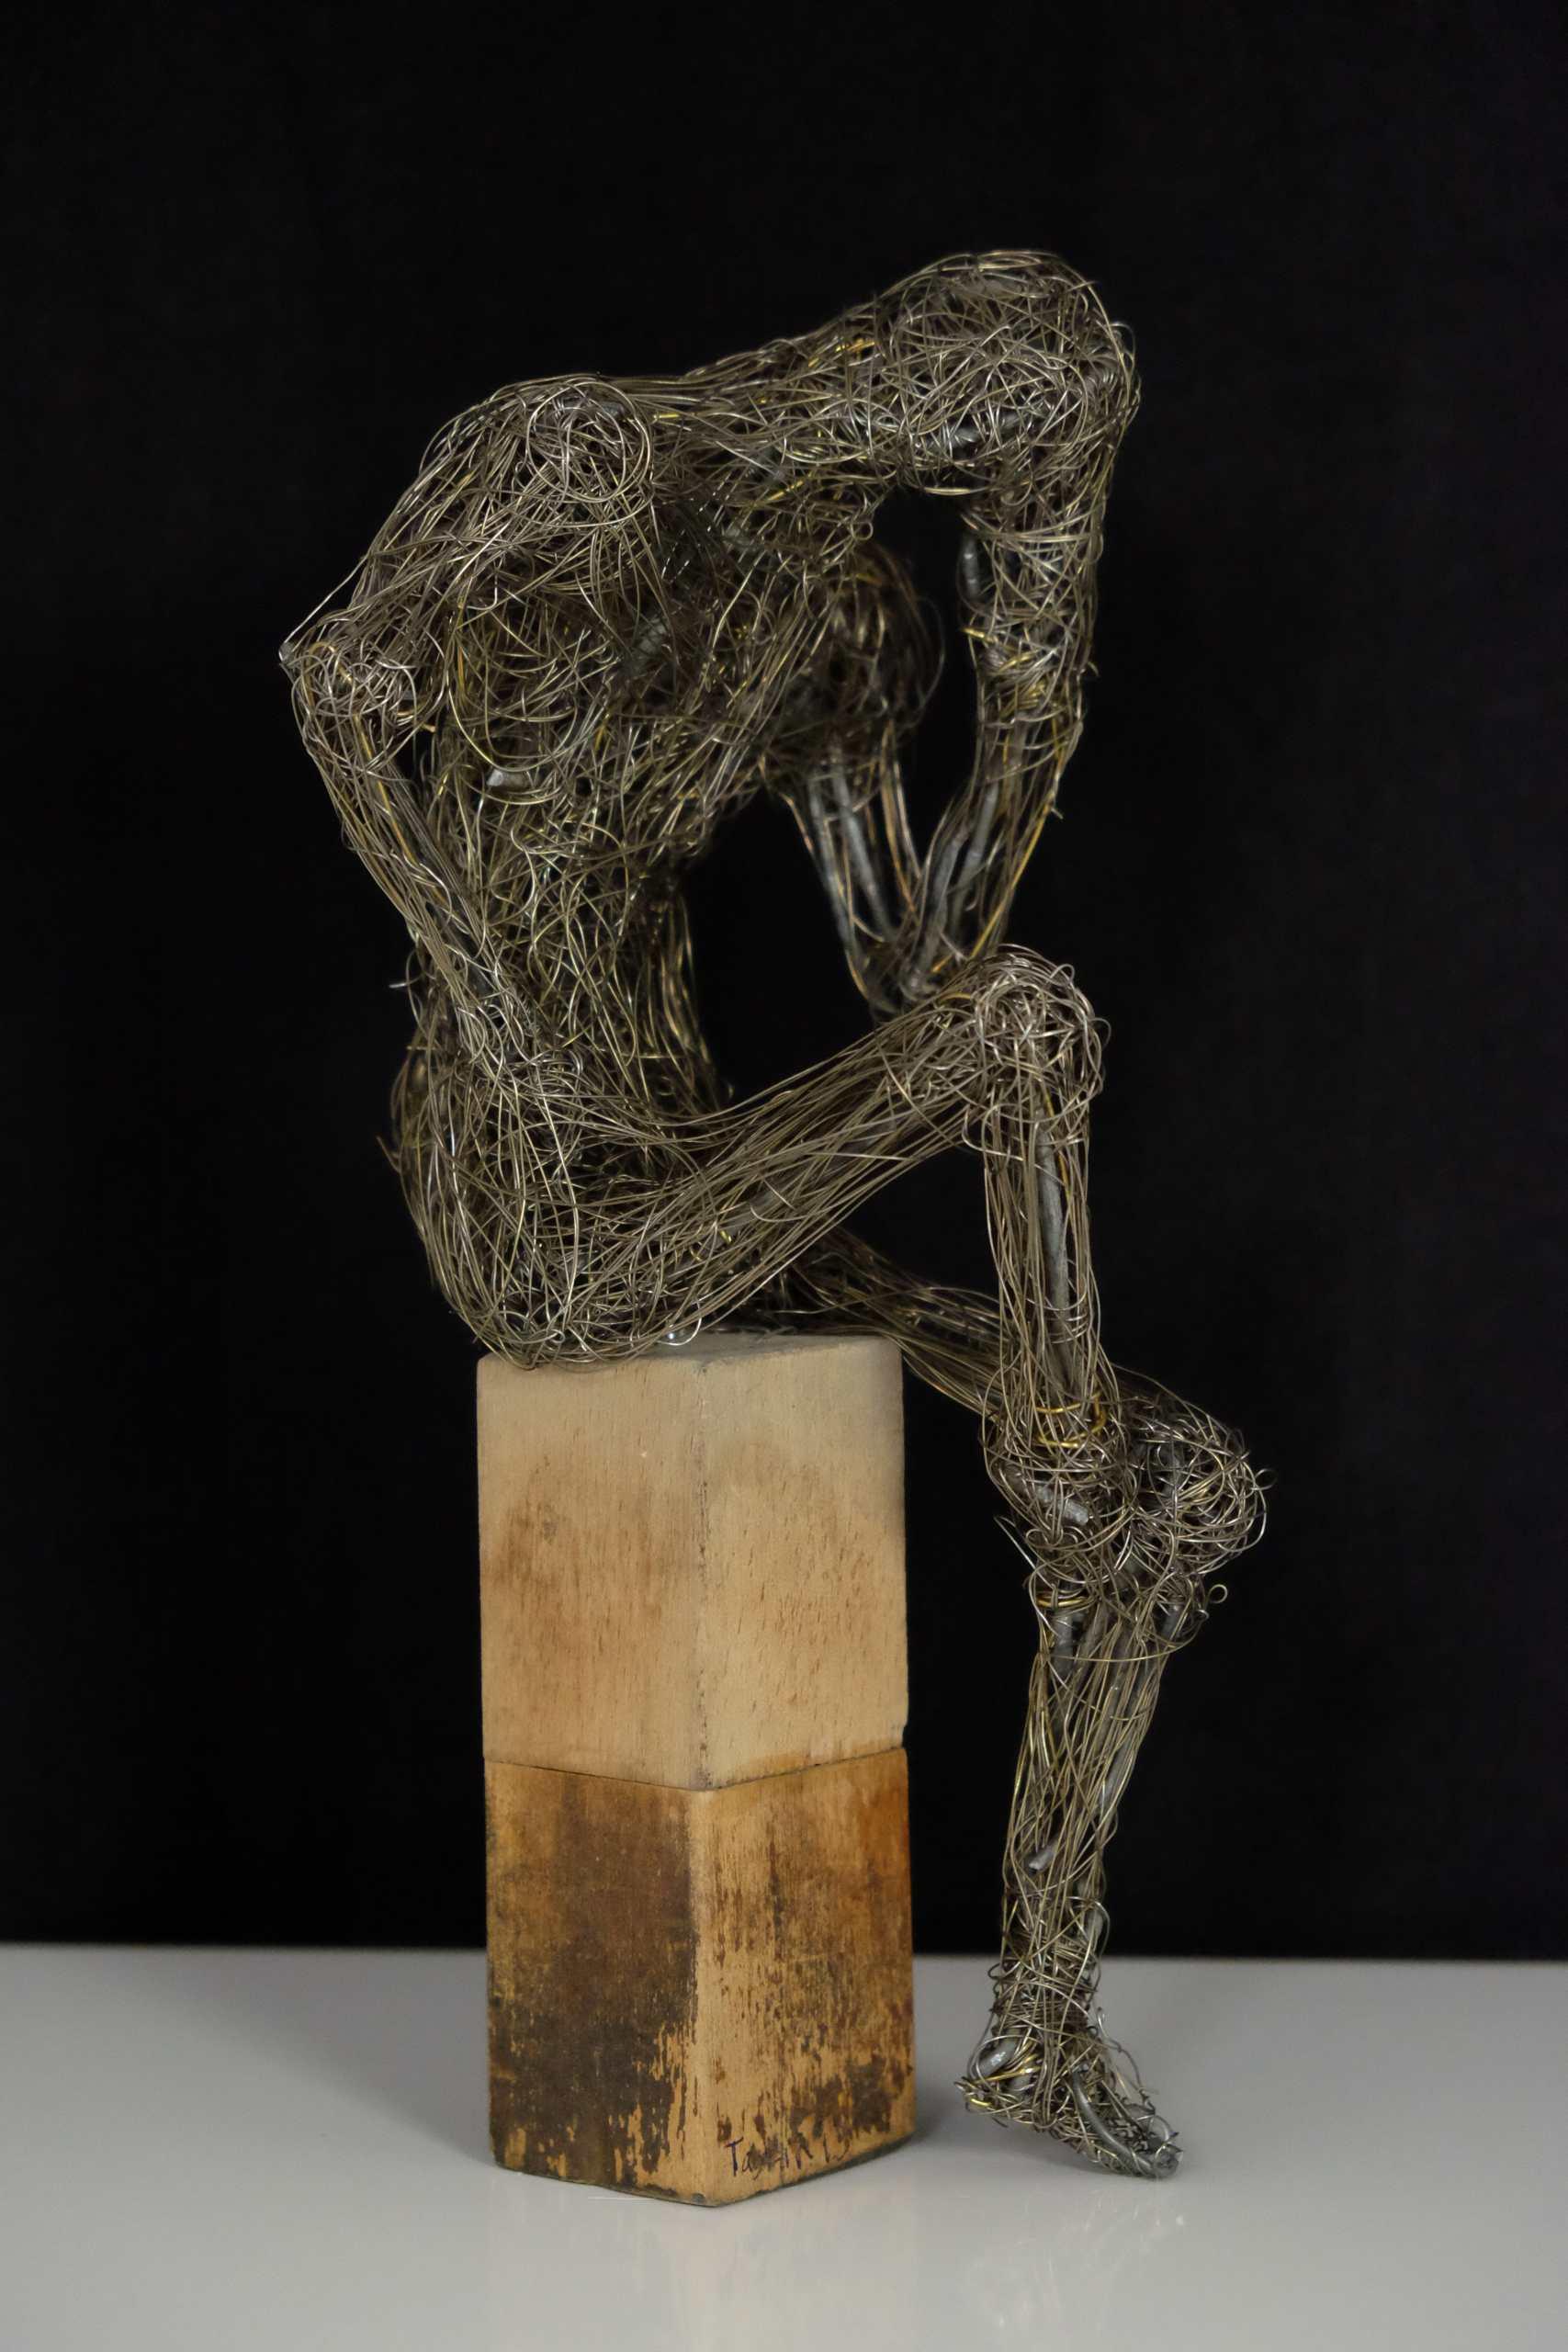 Drahtgeflecht Denker von Murat Taskin